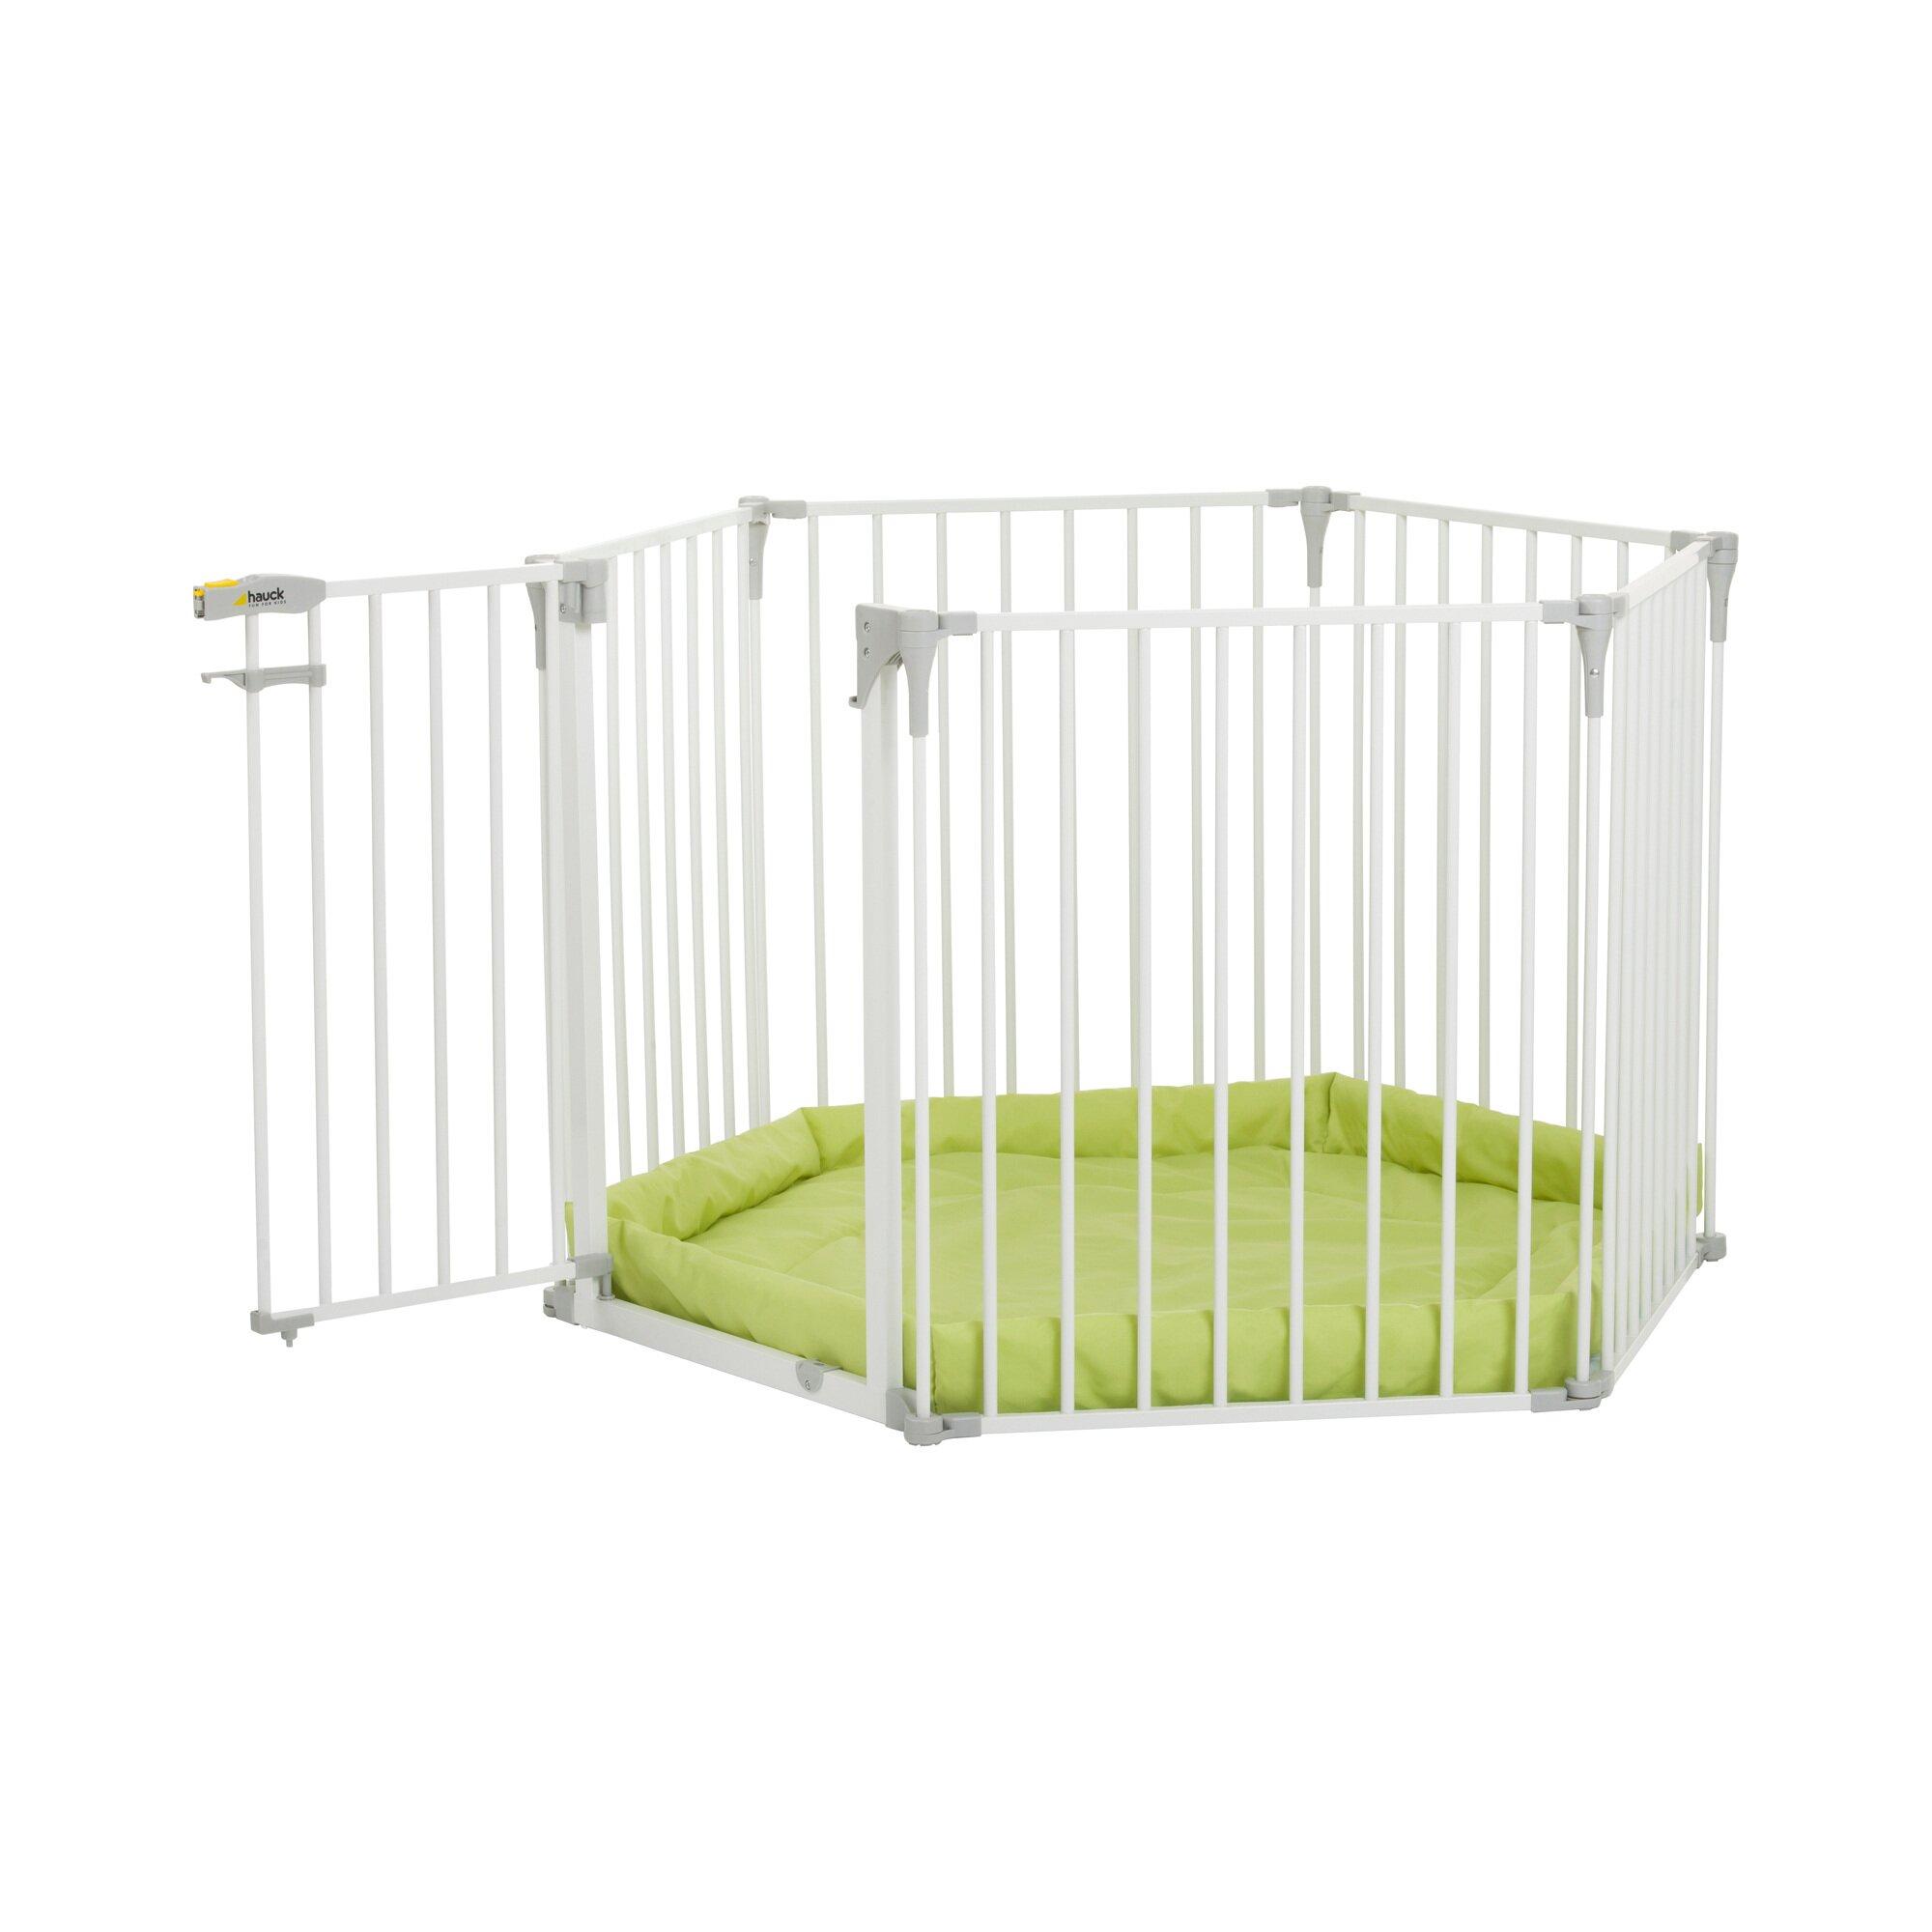 hauck-konfigurationsgitter-baby-park-4in1-weiss